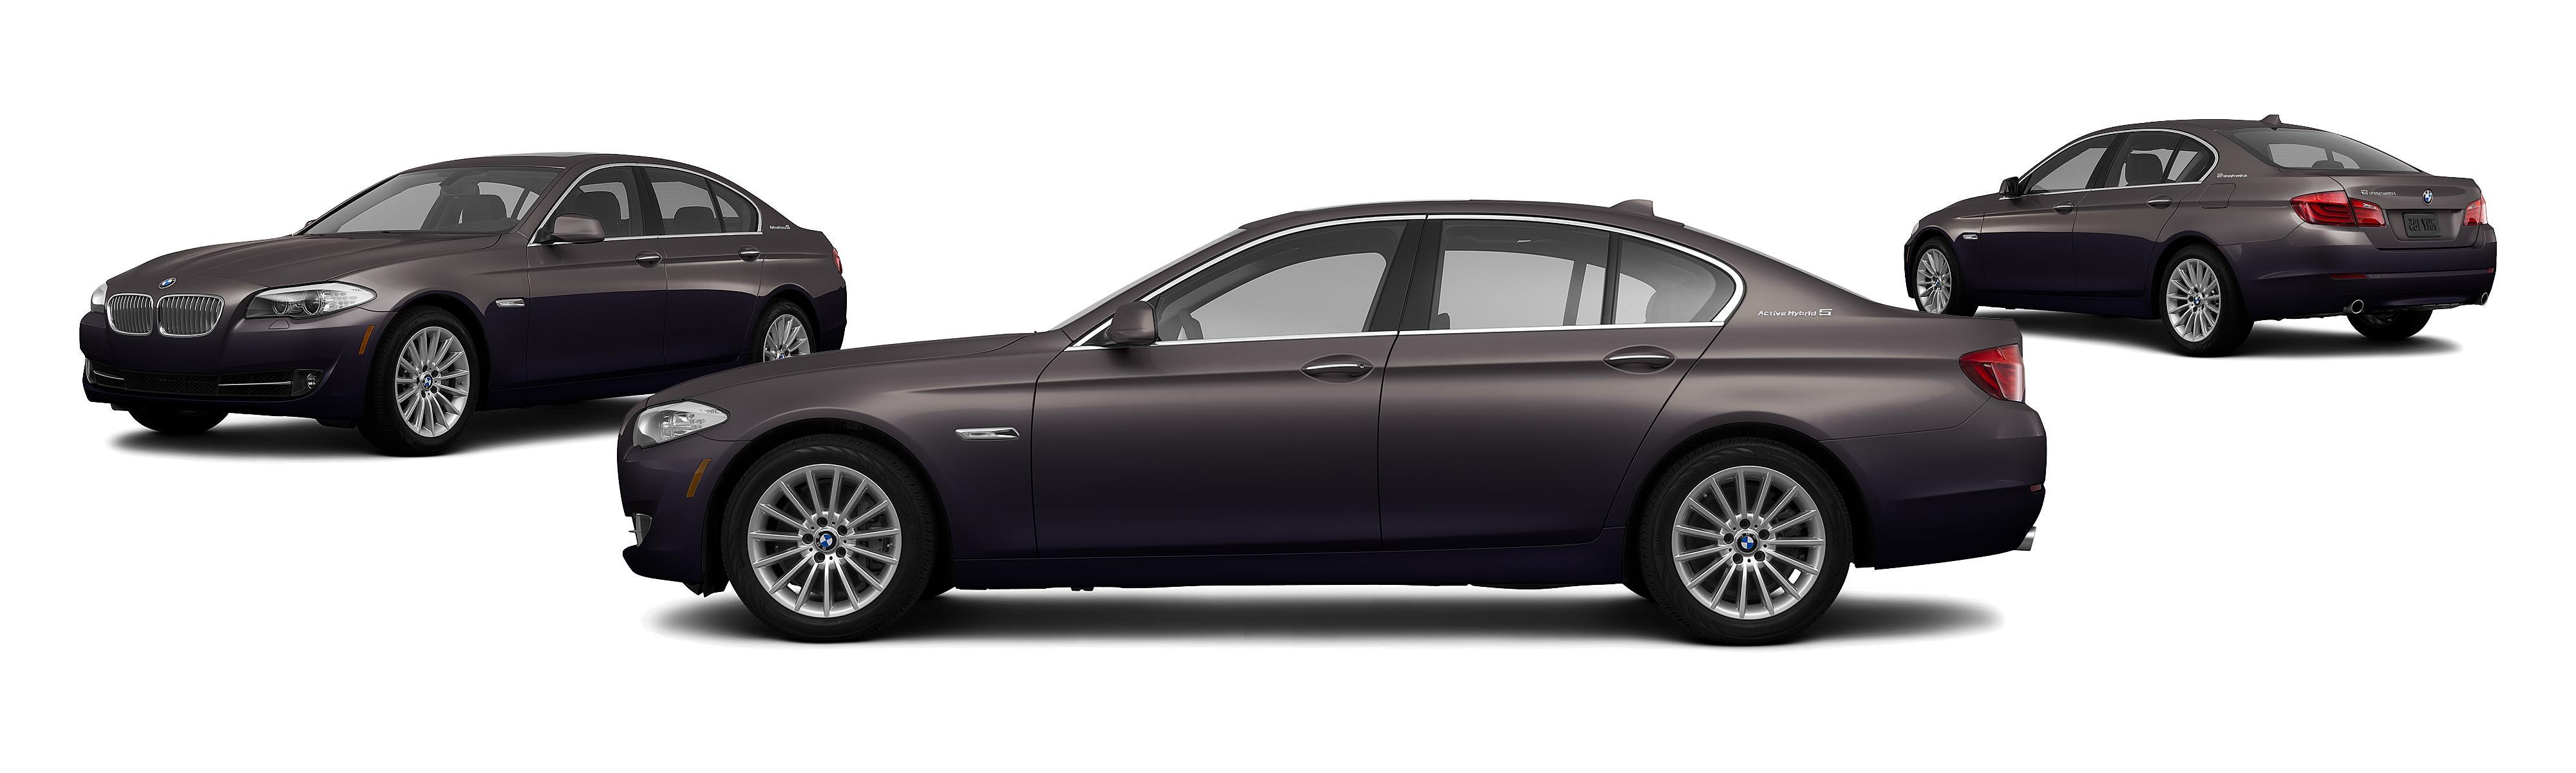 2013 BMW 5 Series ActiveHybrid 5 4dr Sedan - Research - GrooveCar